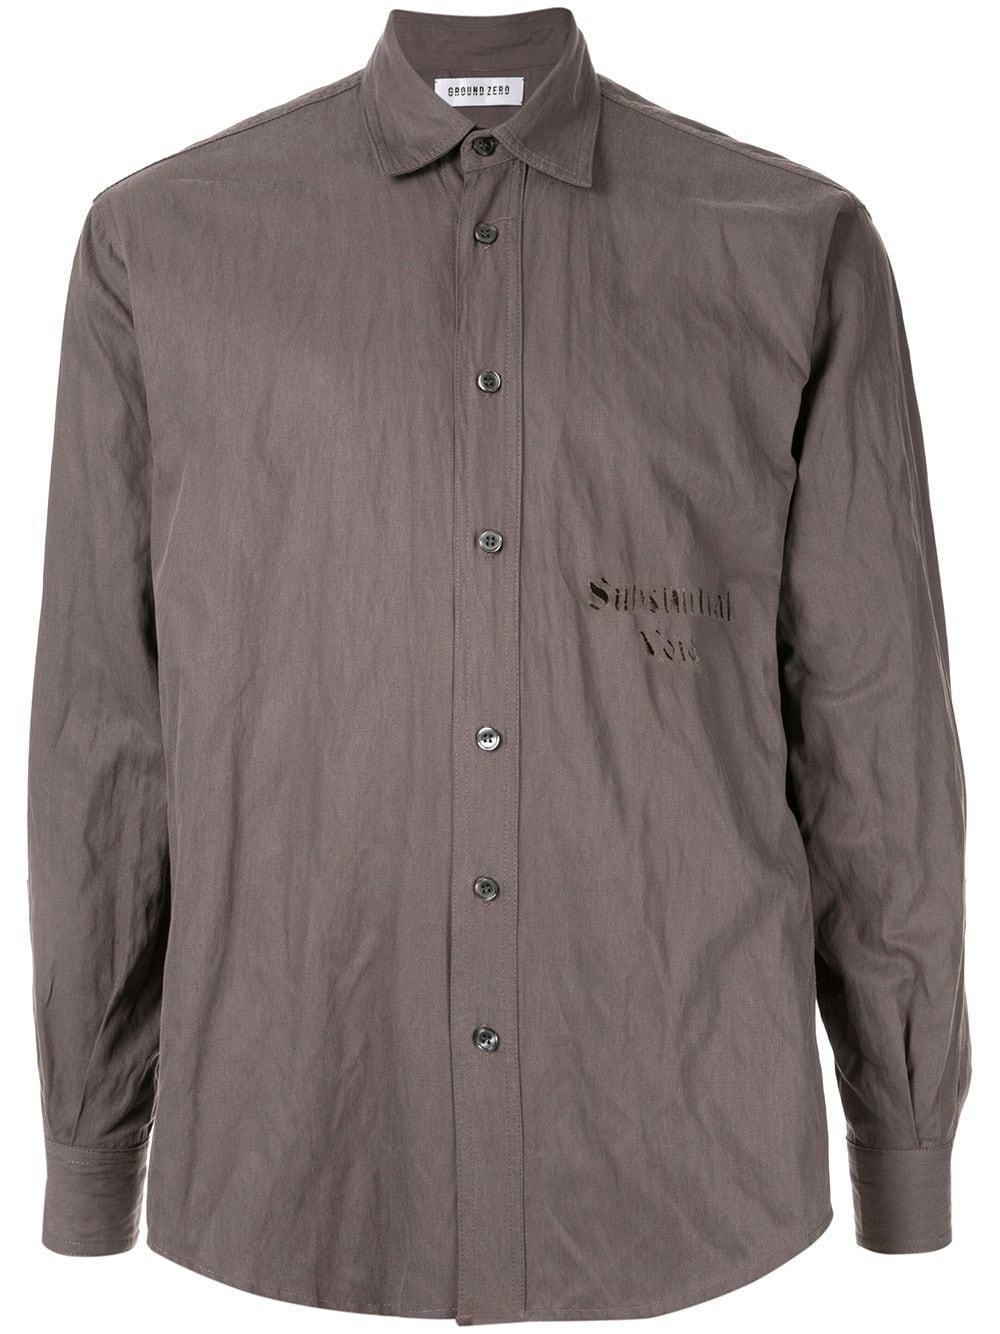 Void Substantial Shirt Ground GreyModesens Zero Yyb7gvf6